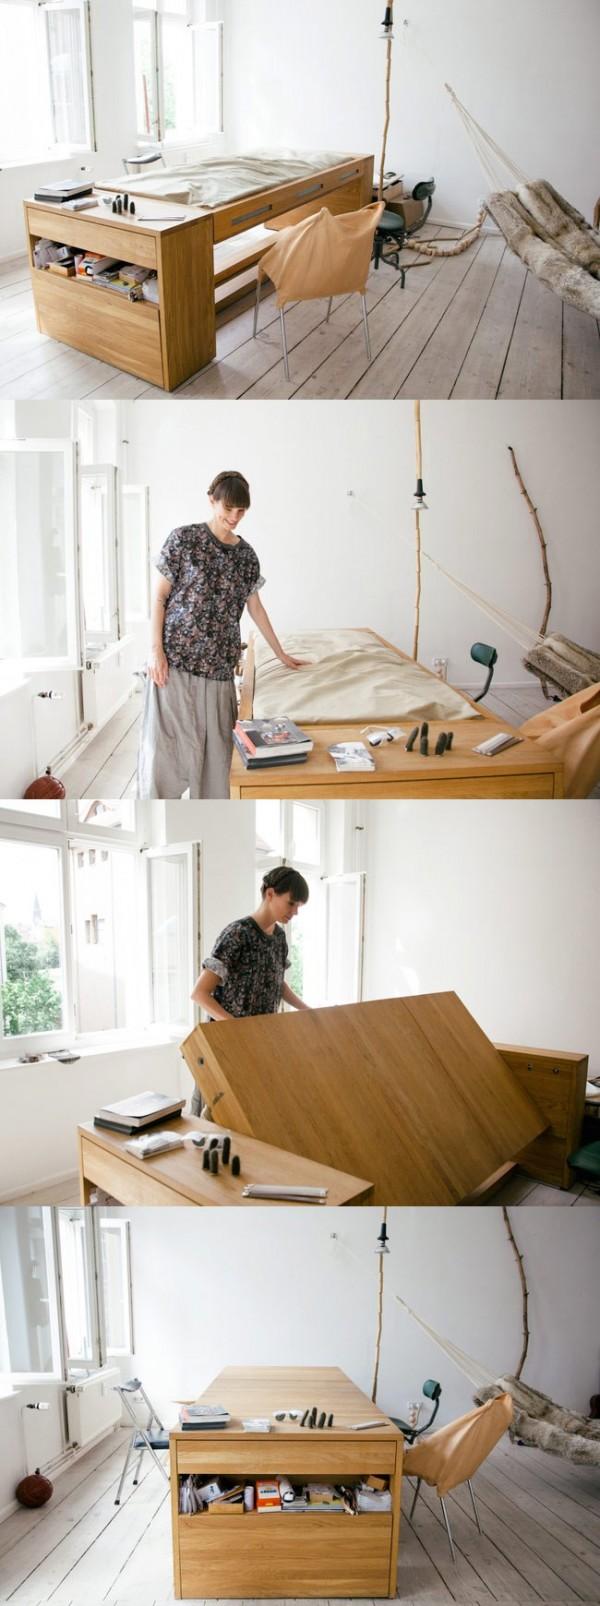 30-Desk-bed-600x1606